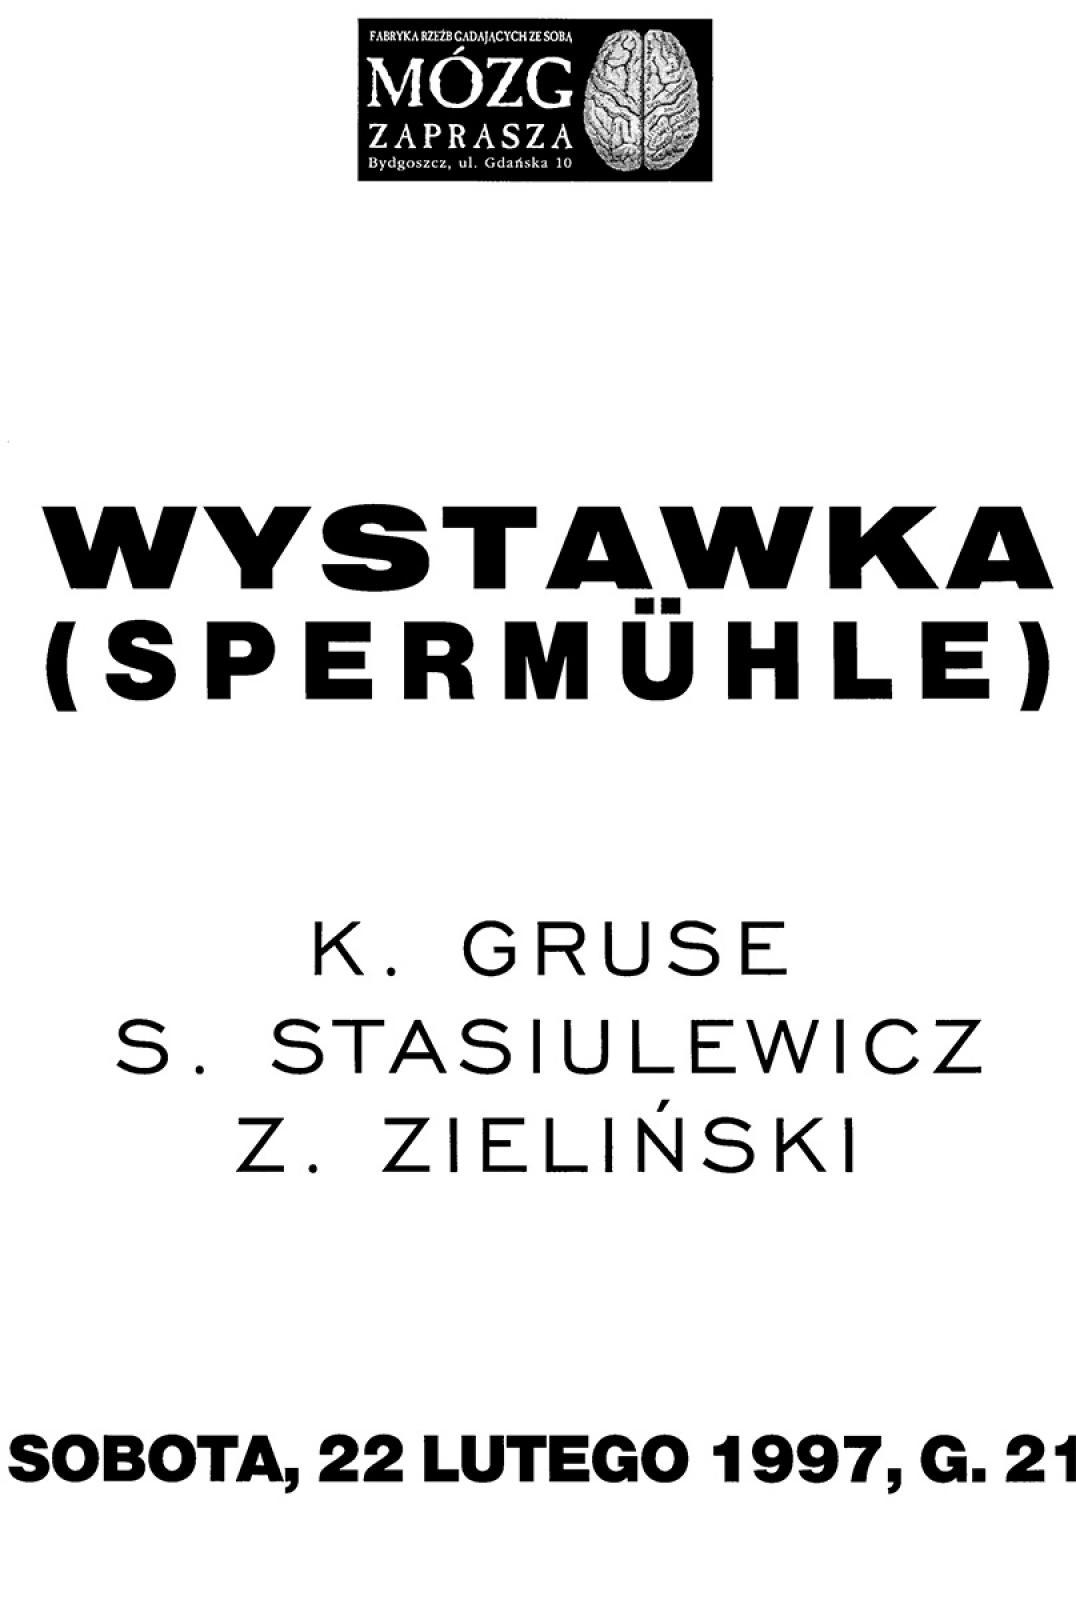 """Spermuhle"" - wystawka"